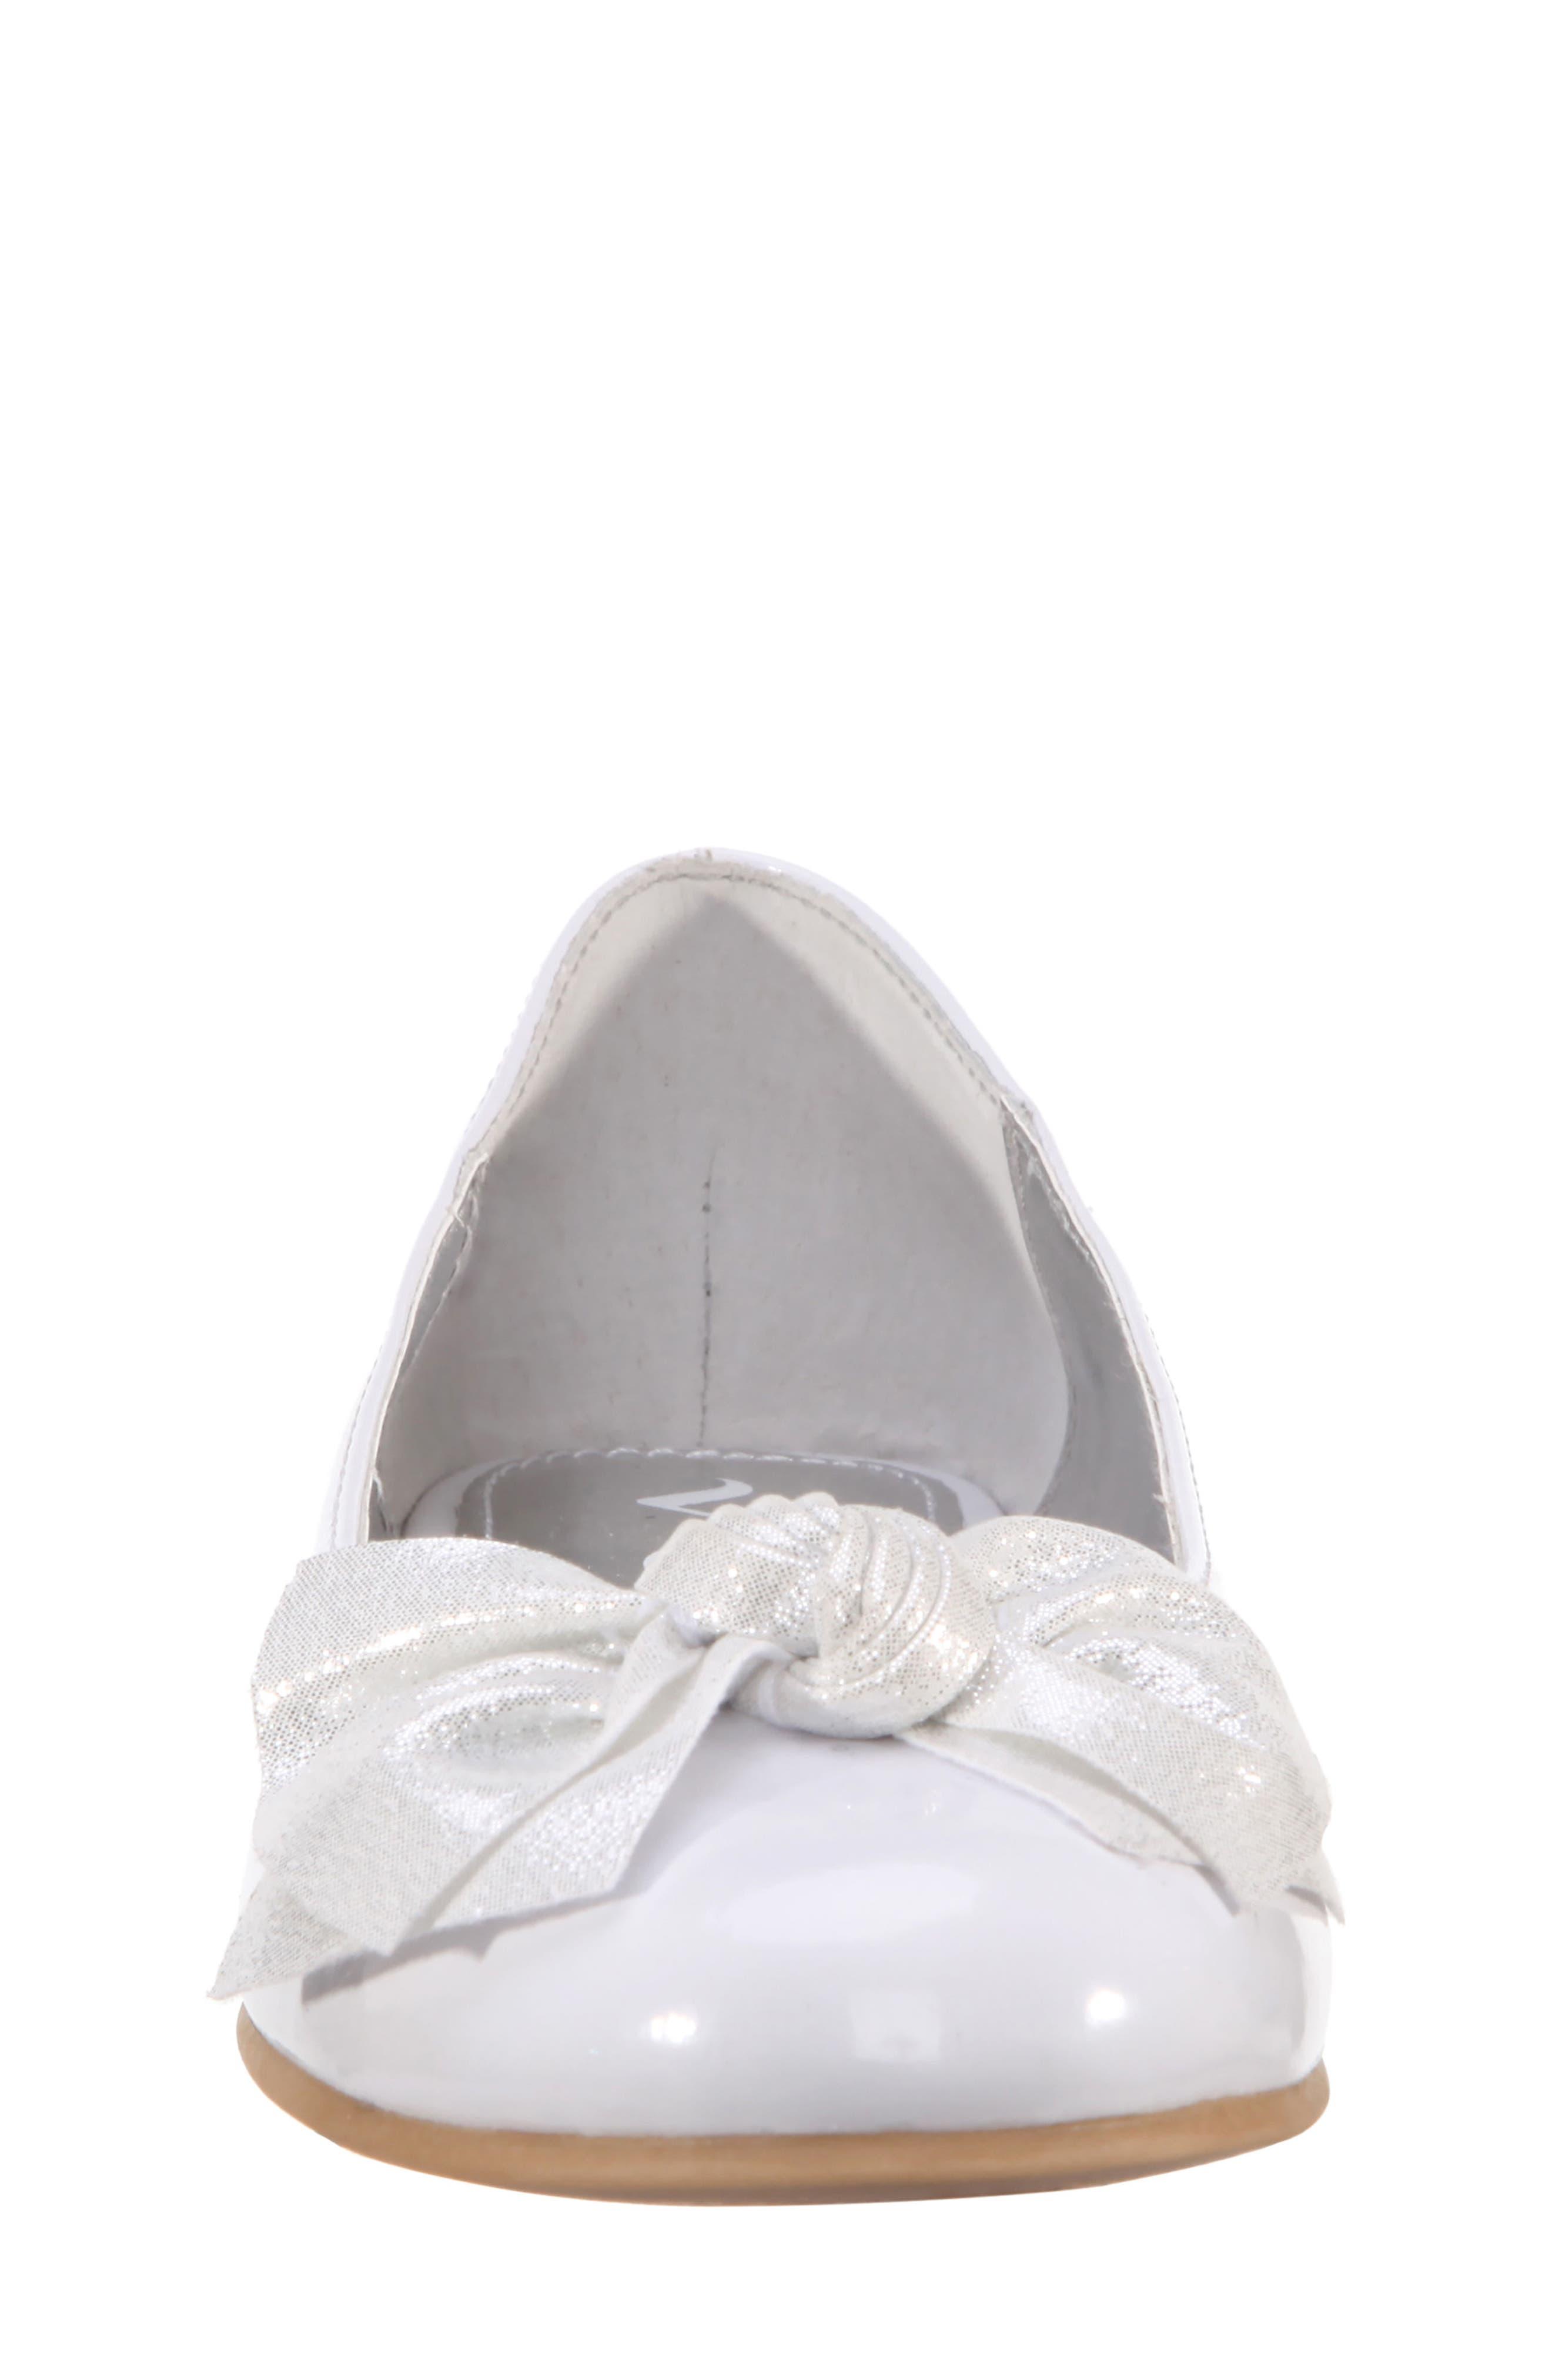 Katelyn Glitter Bow Metallic Ballet Flat,                             Alternate thumbnail 4, color,                             White Patent